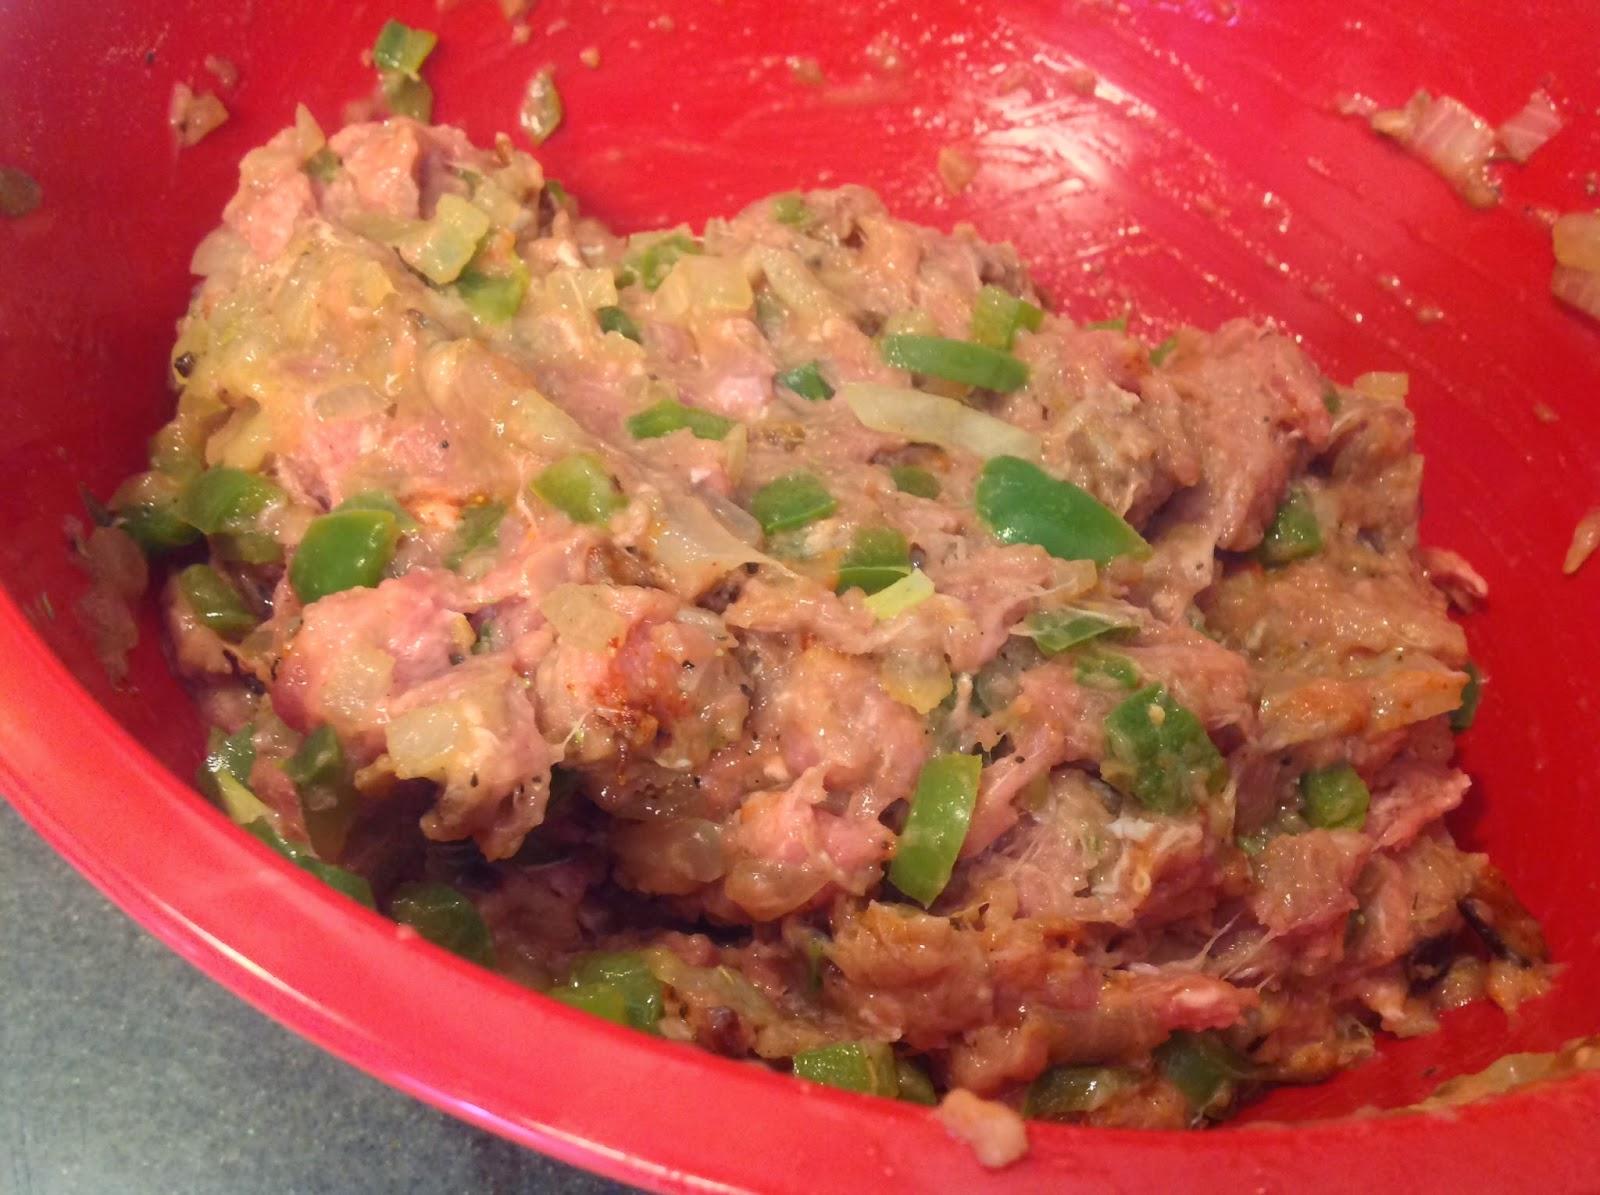 Bake-a-Mania: Emeril's Turkey Meatloaf